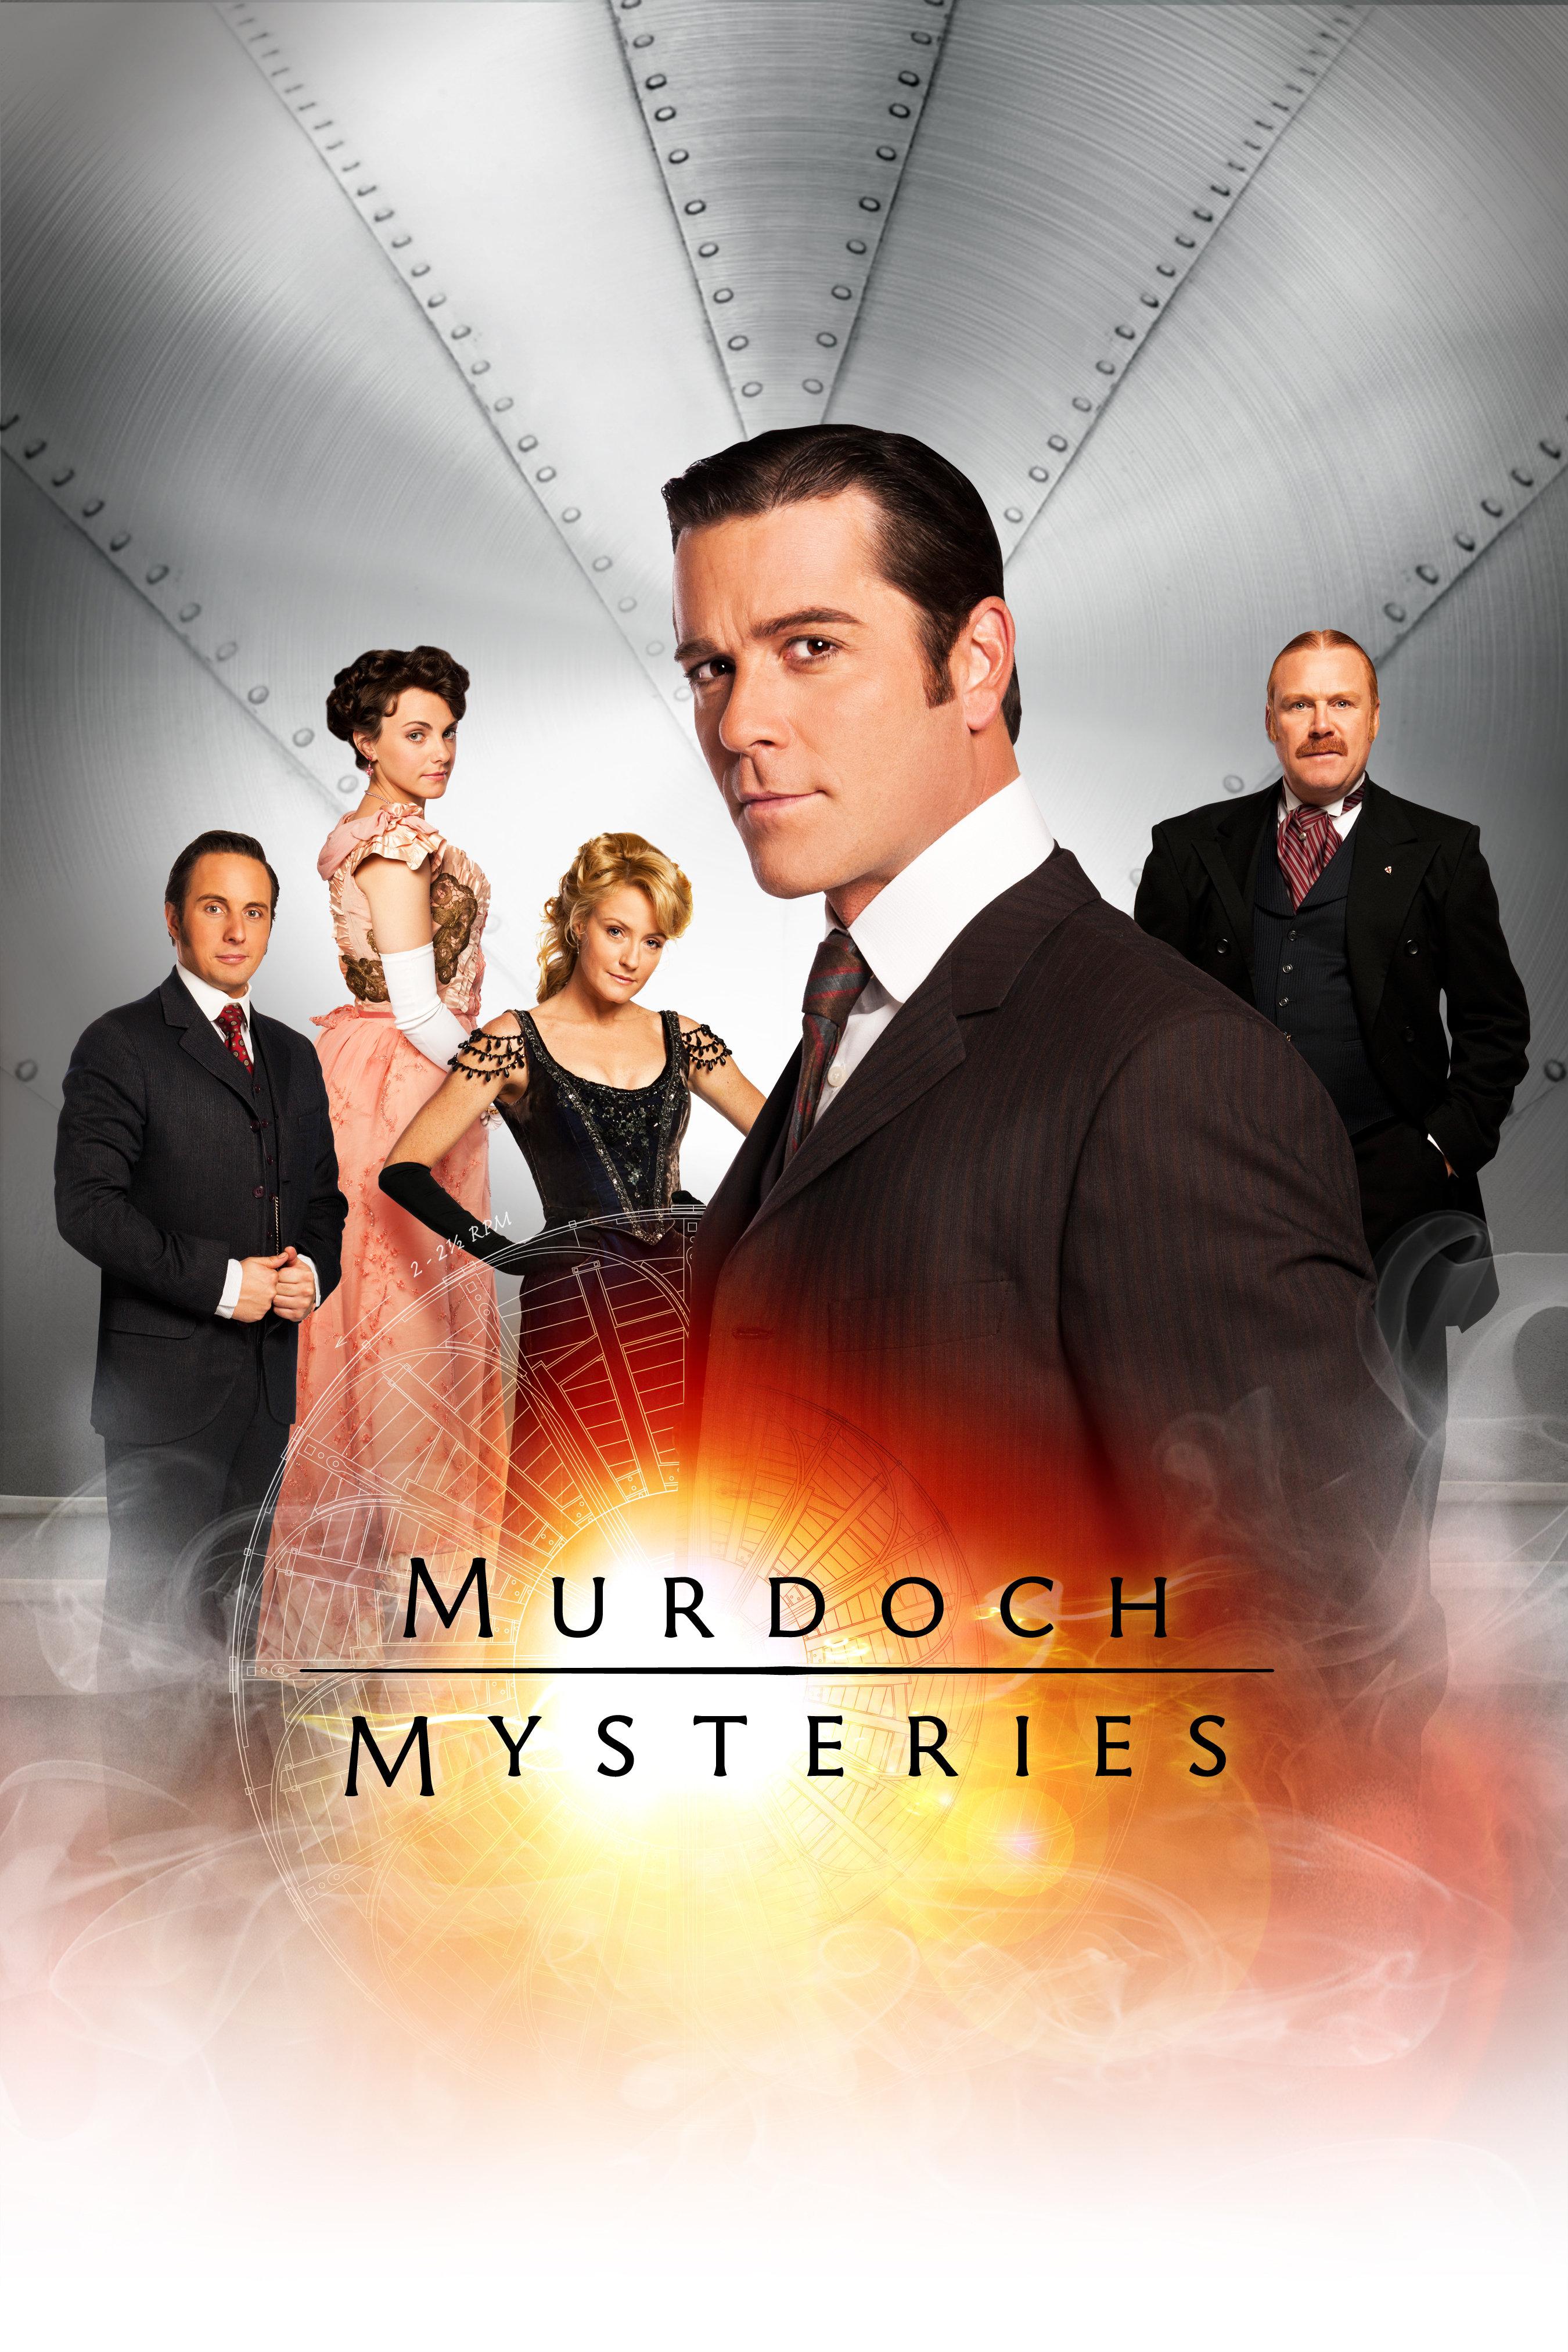 Murdoch.Mysteries.S08E02.MULTi.1080p.HDTV.H264-SH0W